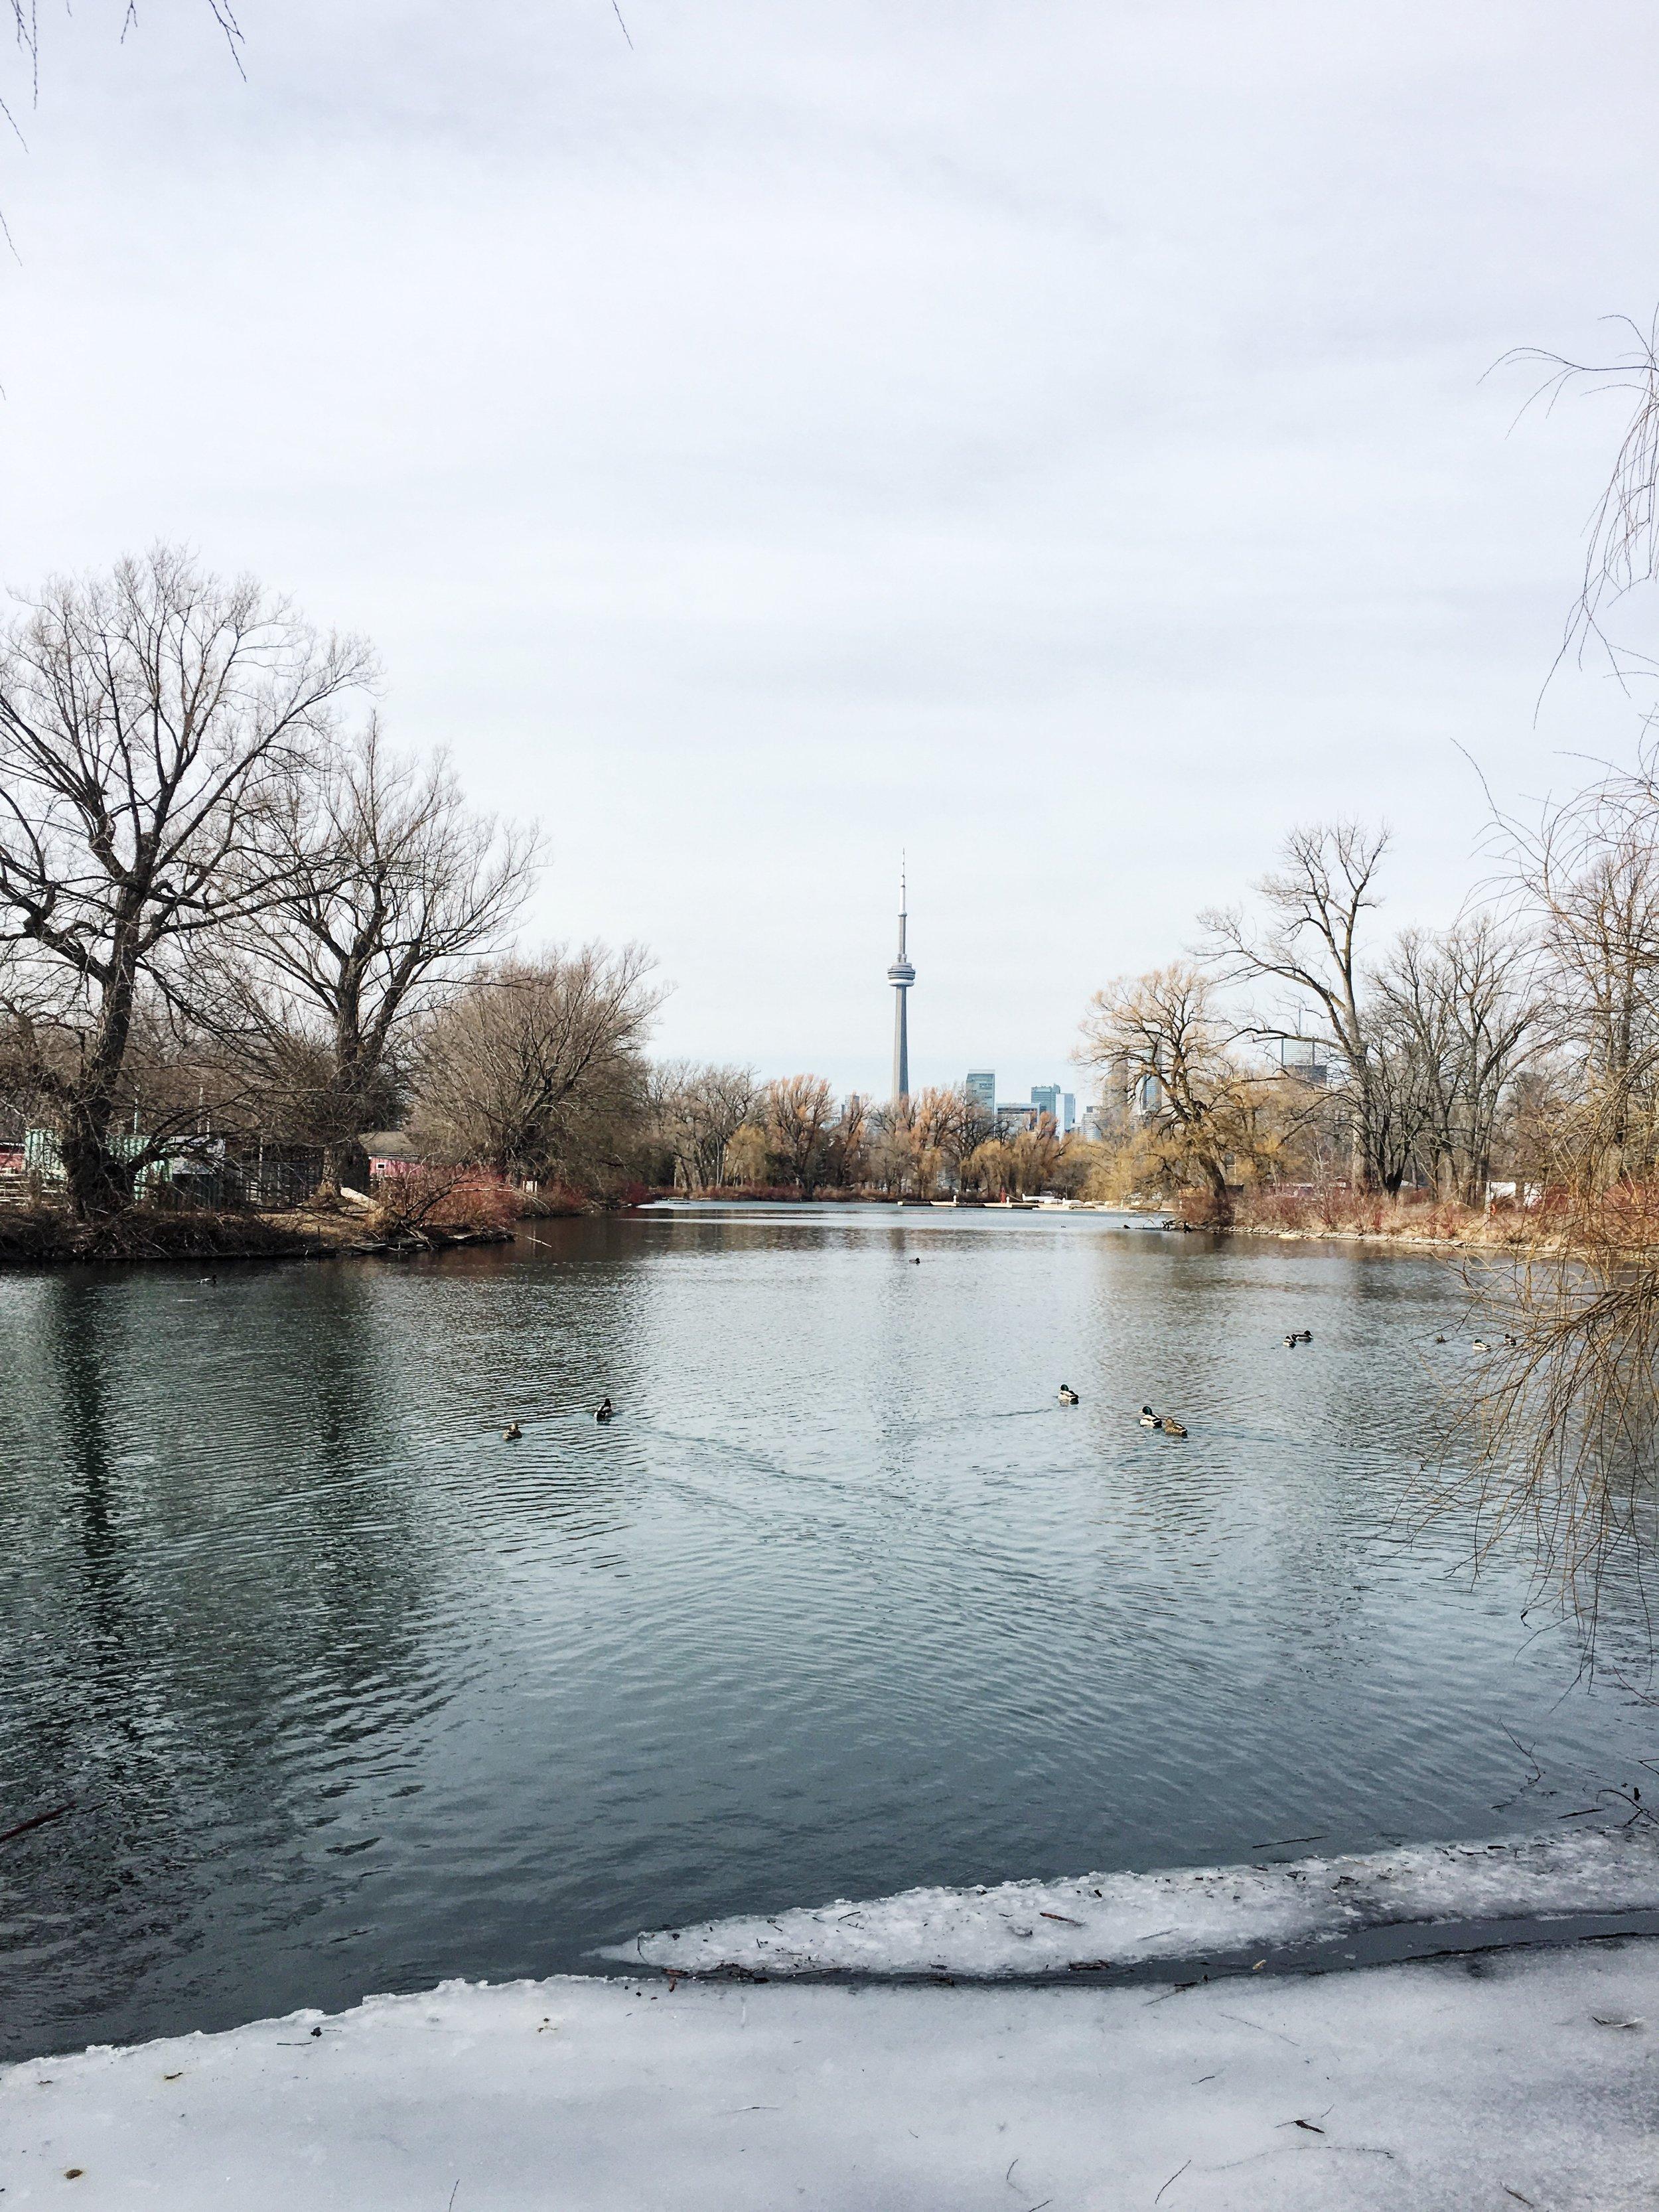 From Toronto island